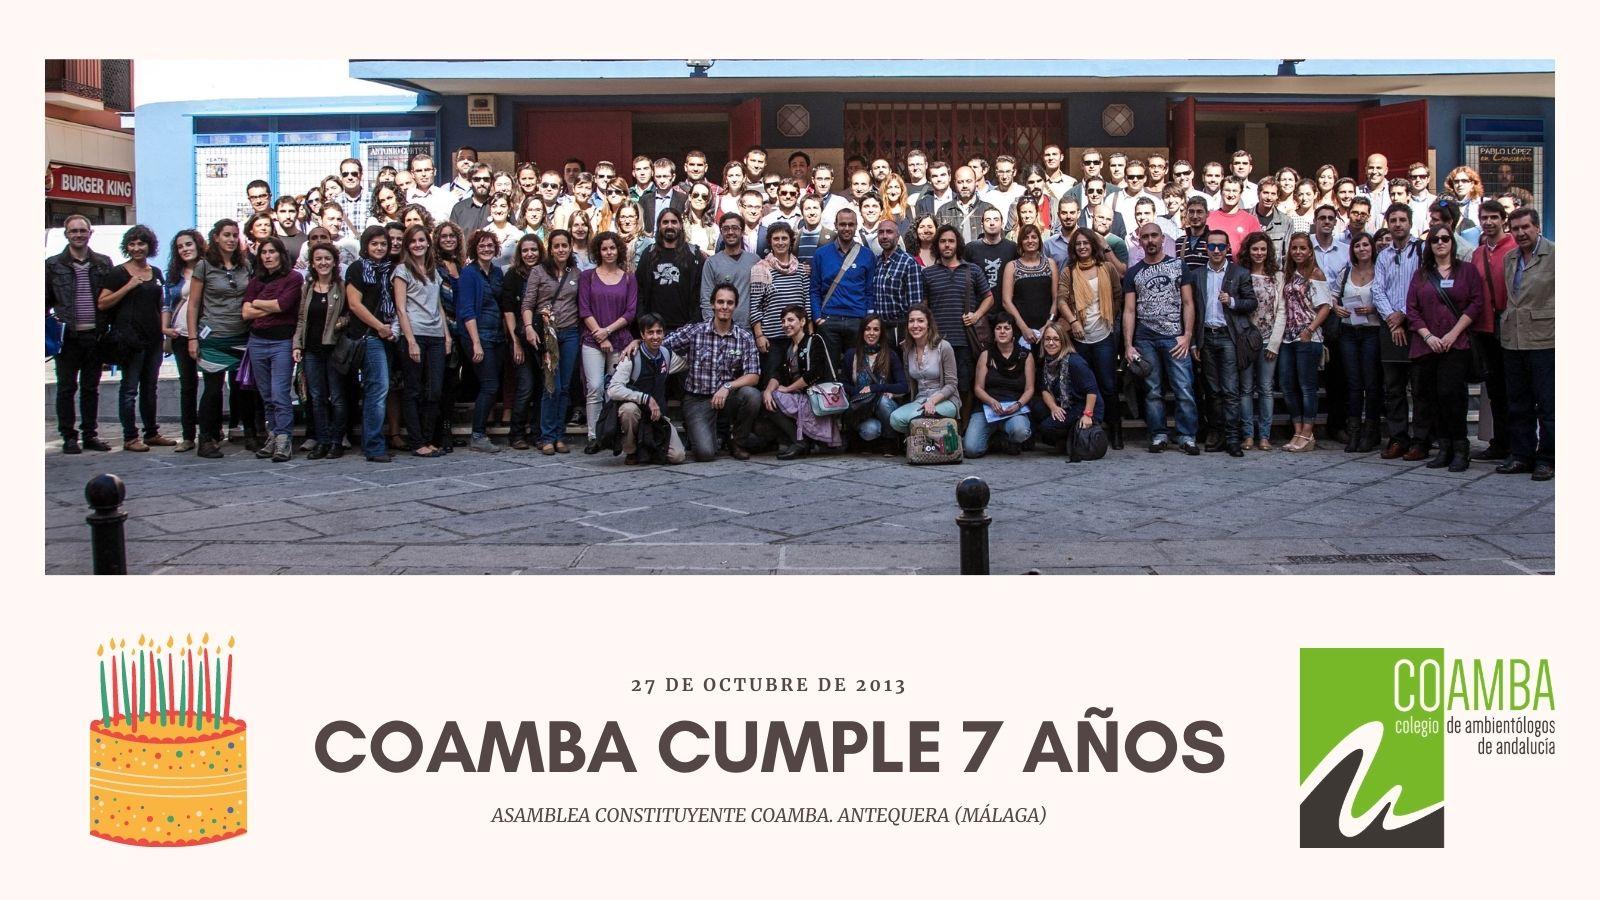 COAMBA CUMPLE 7 AÑOS